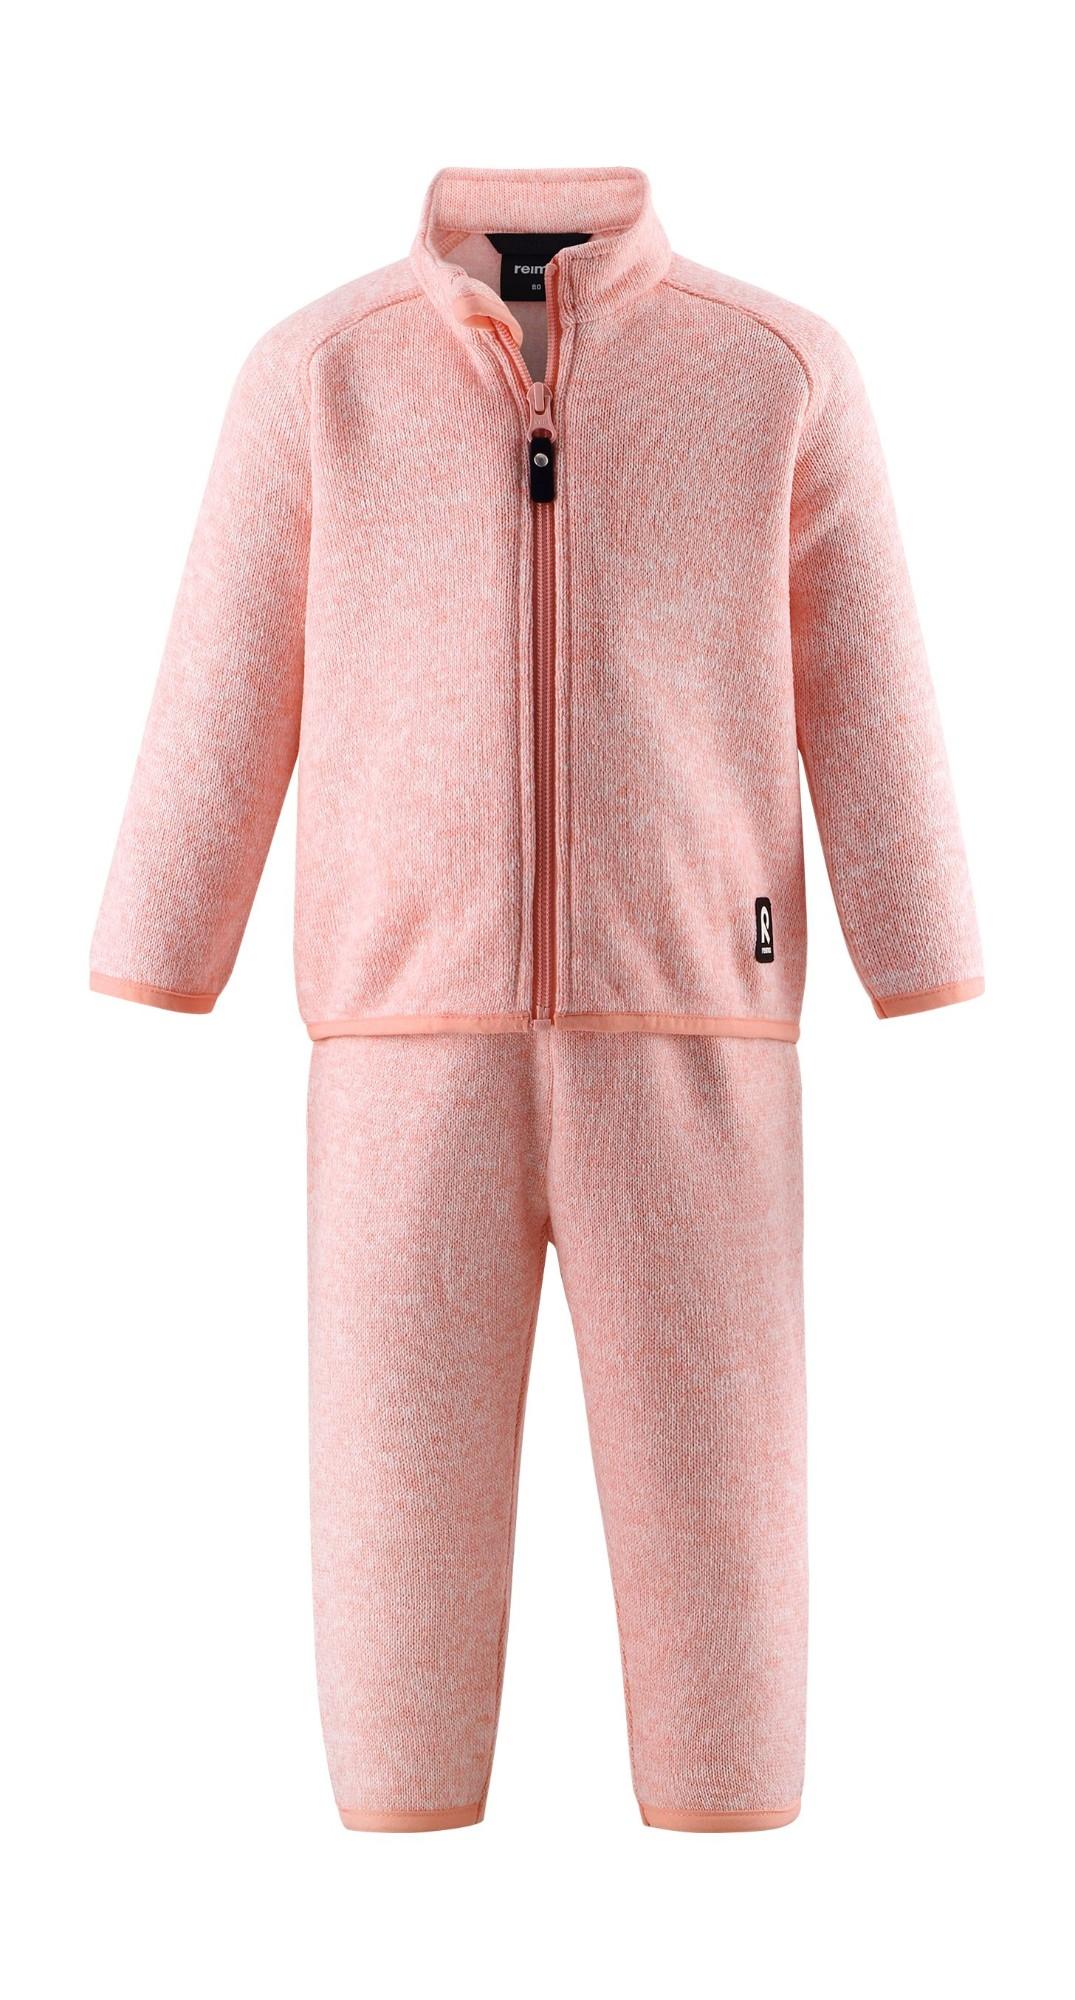 REIMA Tahto Bubblegum Pink 86